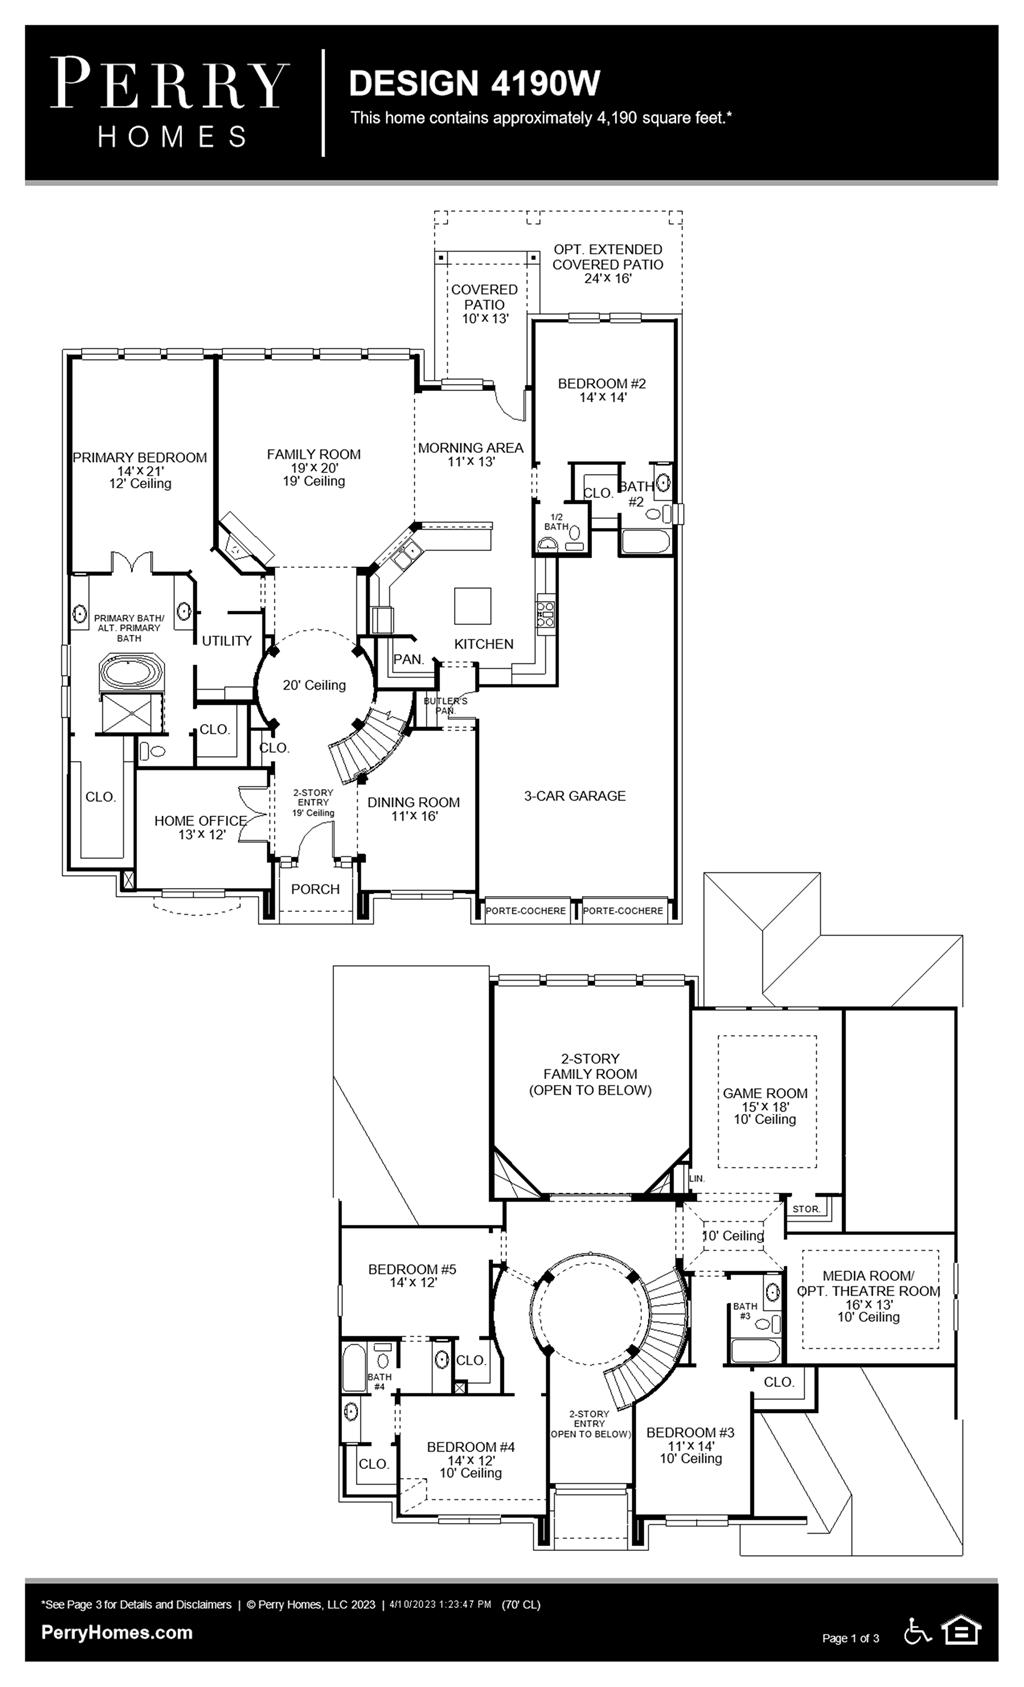 Floor Plan for 4190W